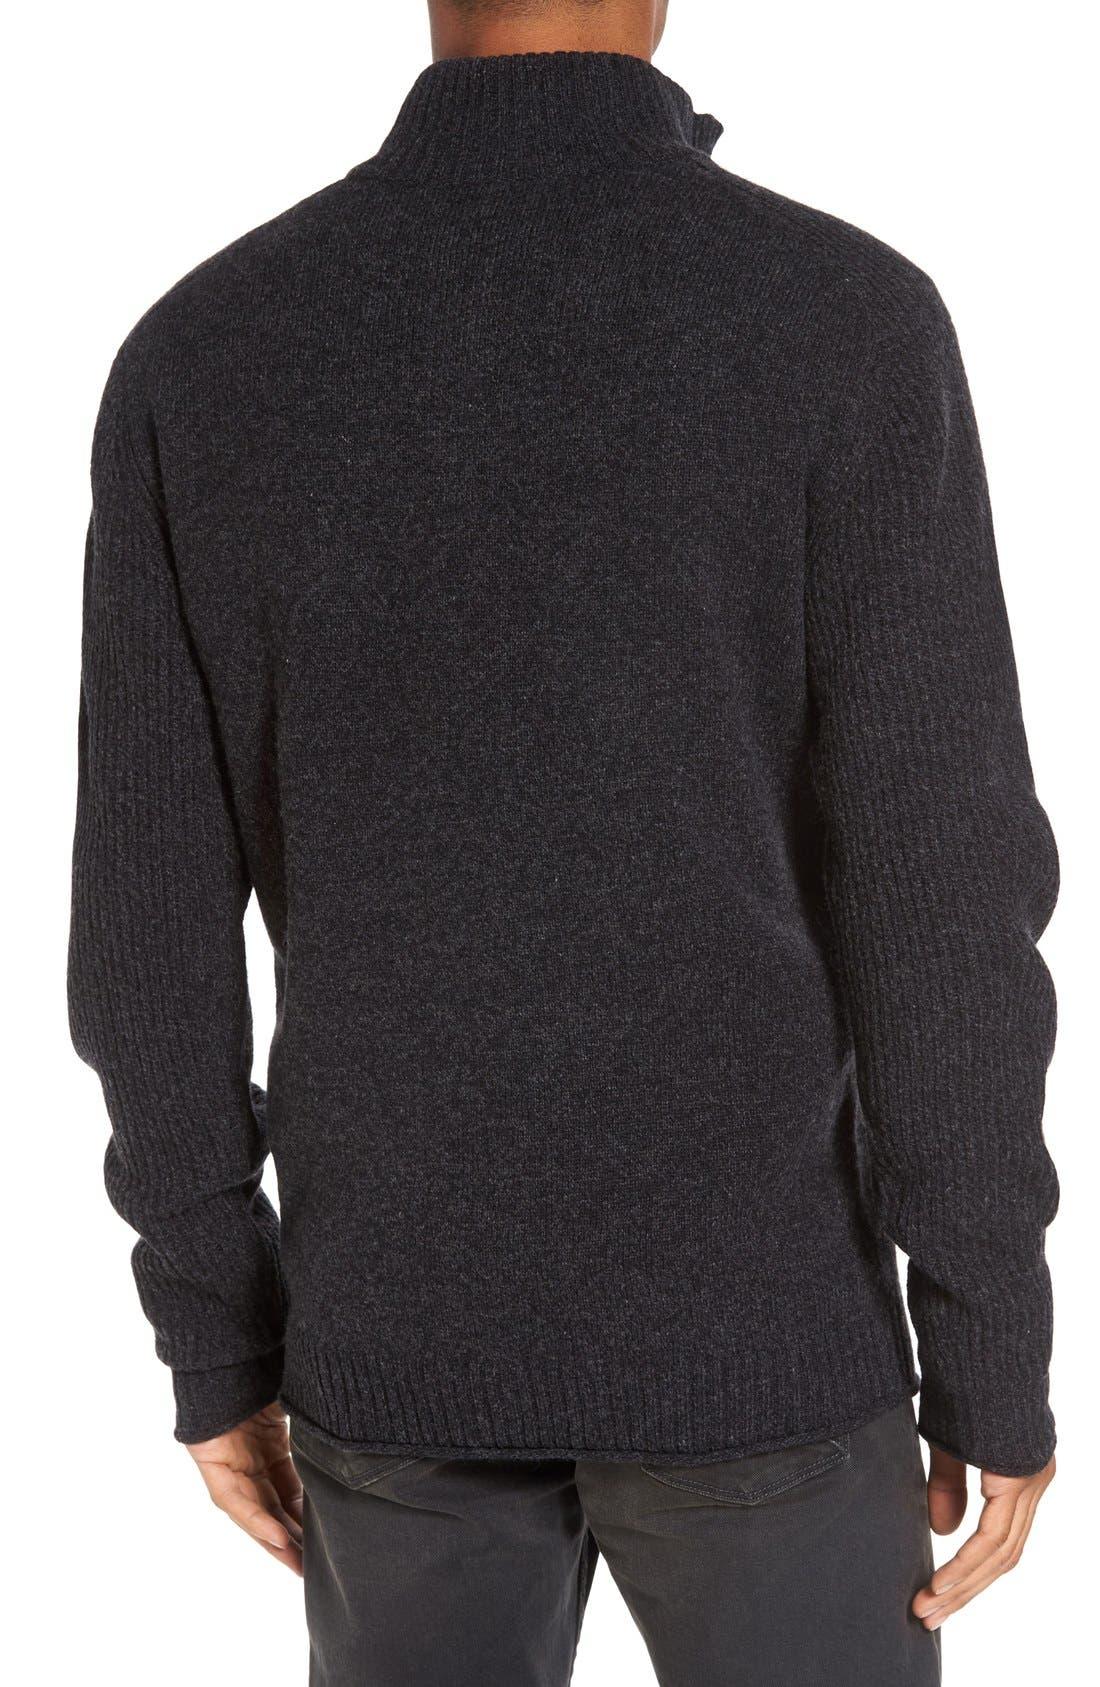 Birkenhead Mock Neck Sweater,                             Alternate thumbnail 2, color,                             021